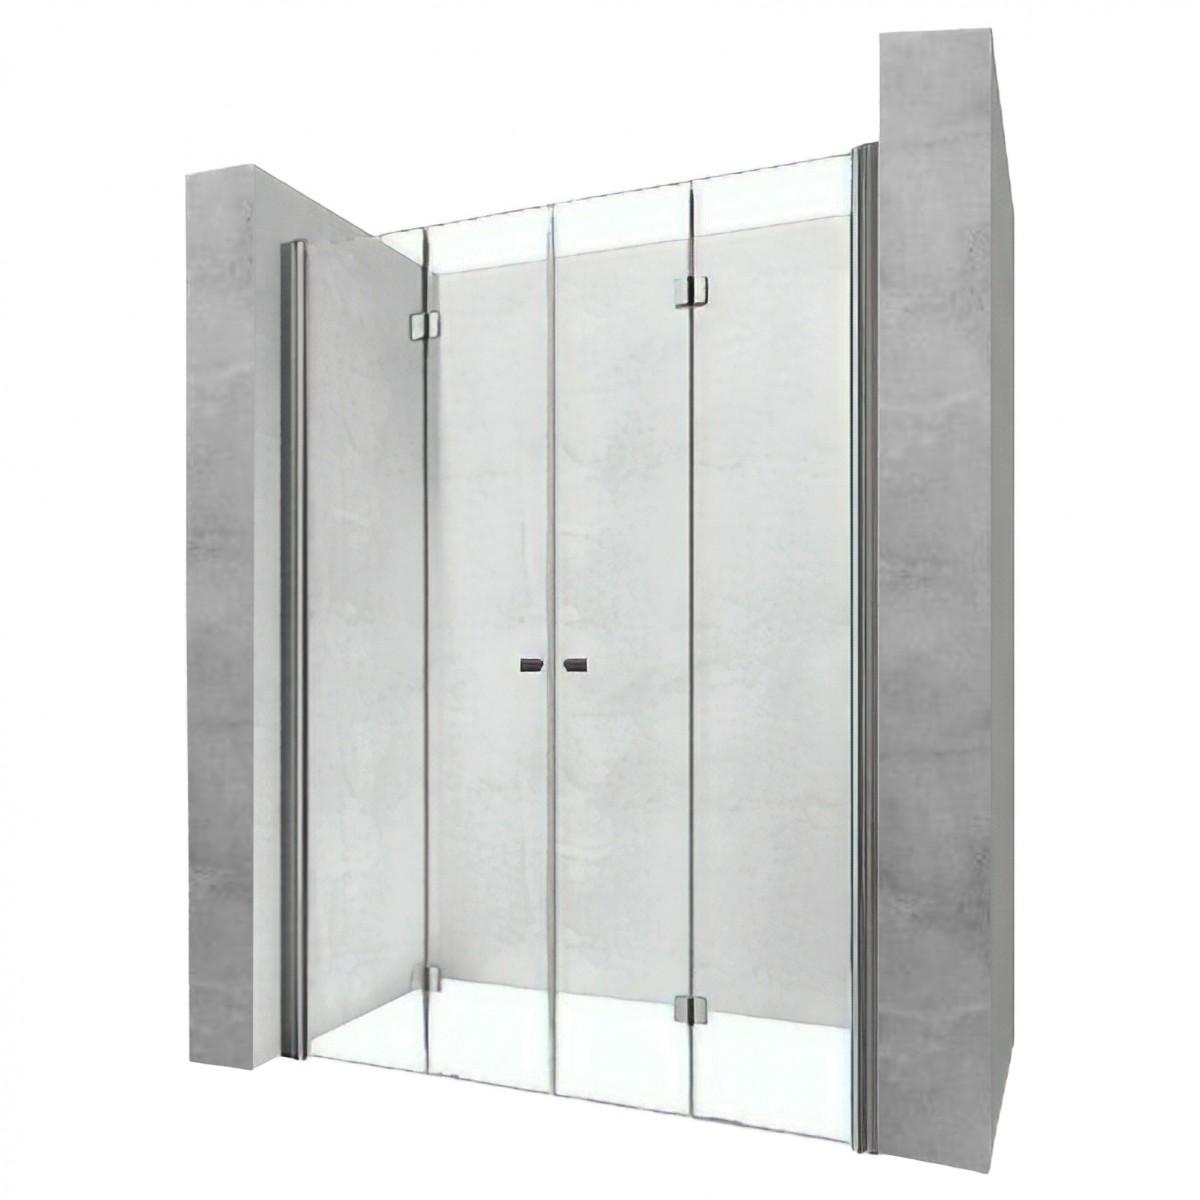 Sprchové dveře DOUBLE MY SPACE 70